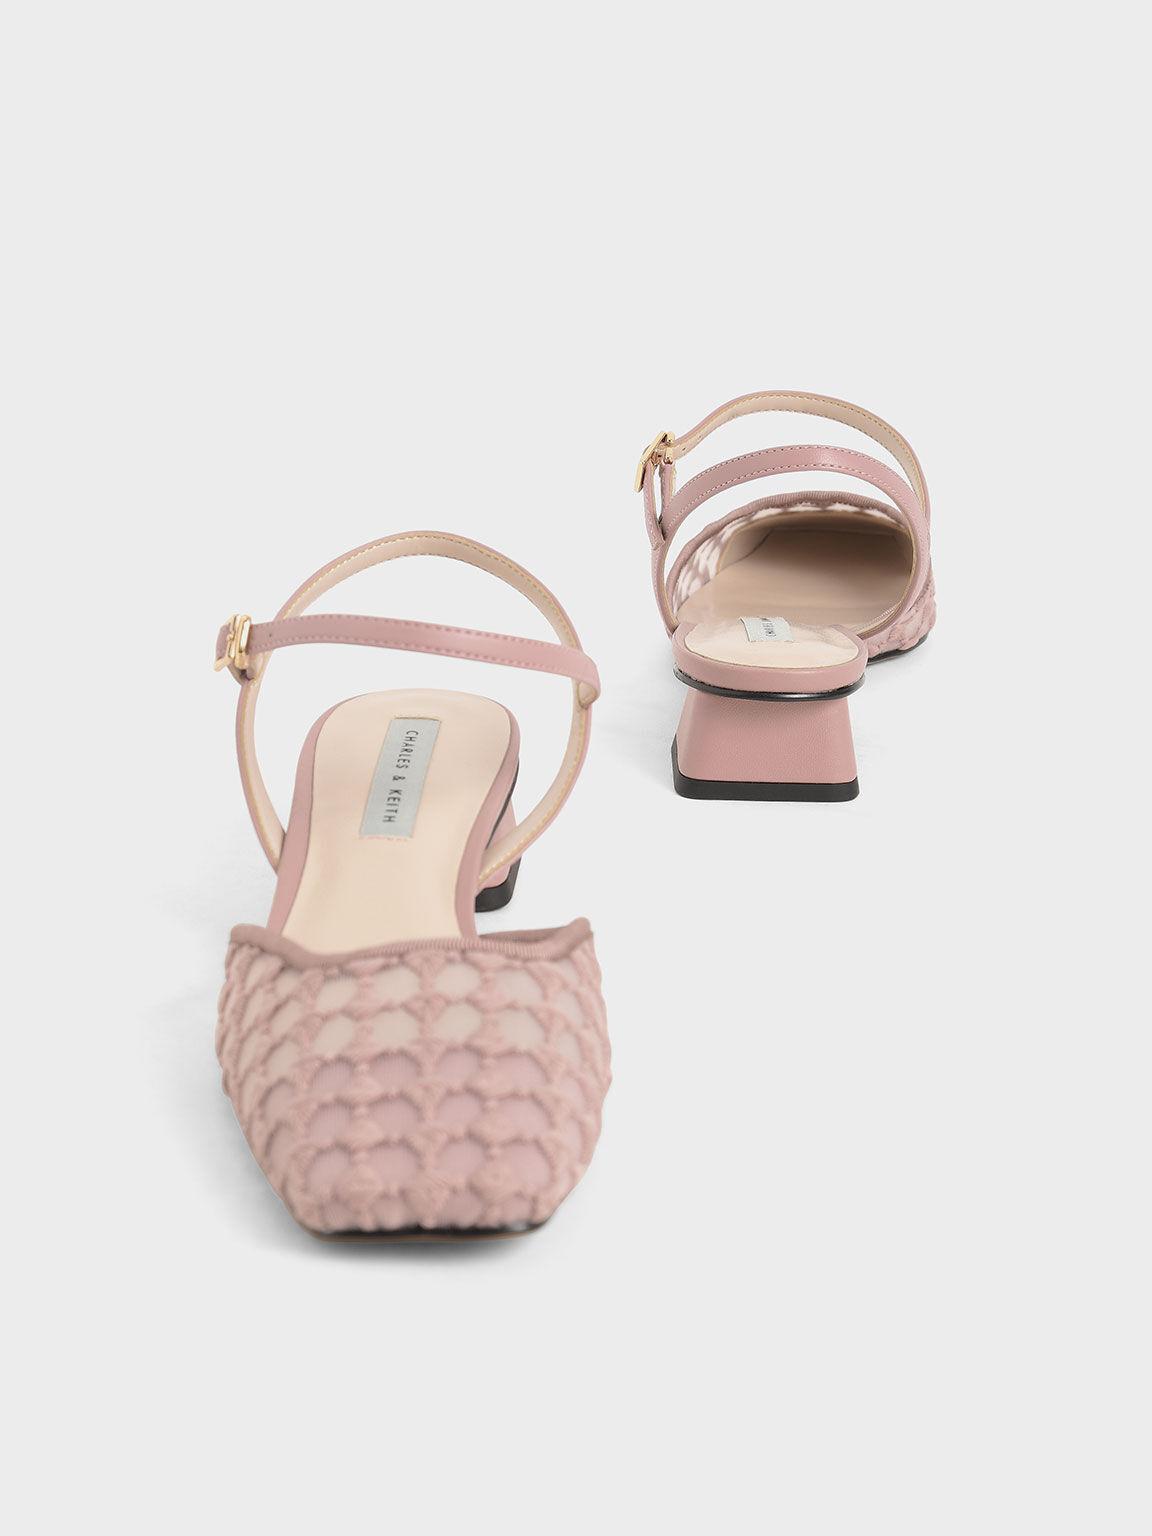 Lace Square Toe Pumps, Light Pink, hi-res